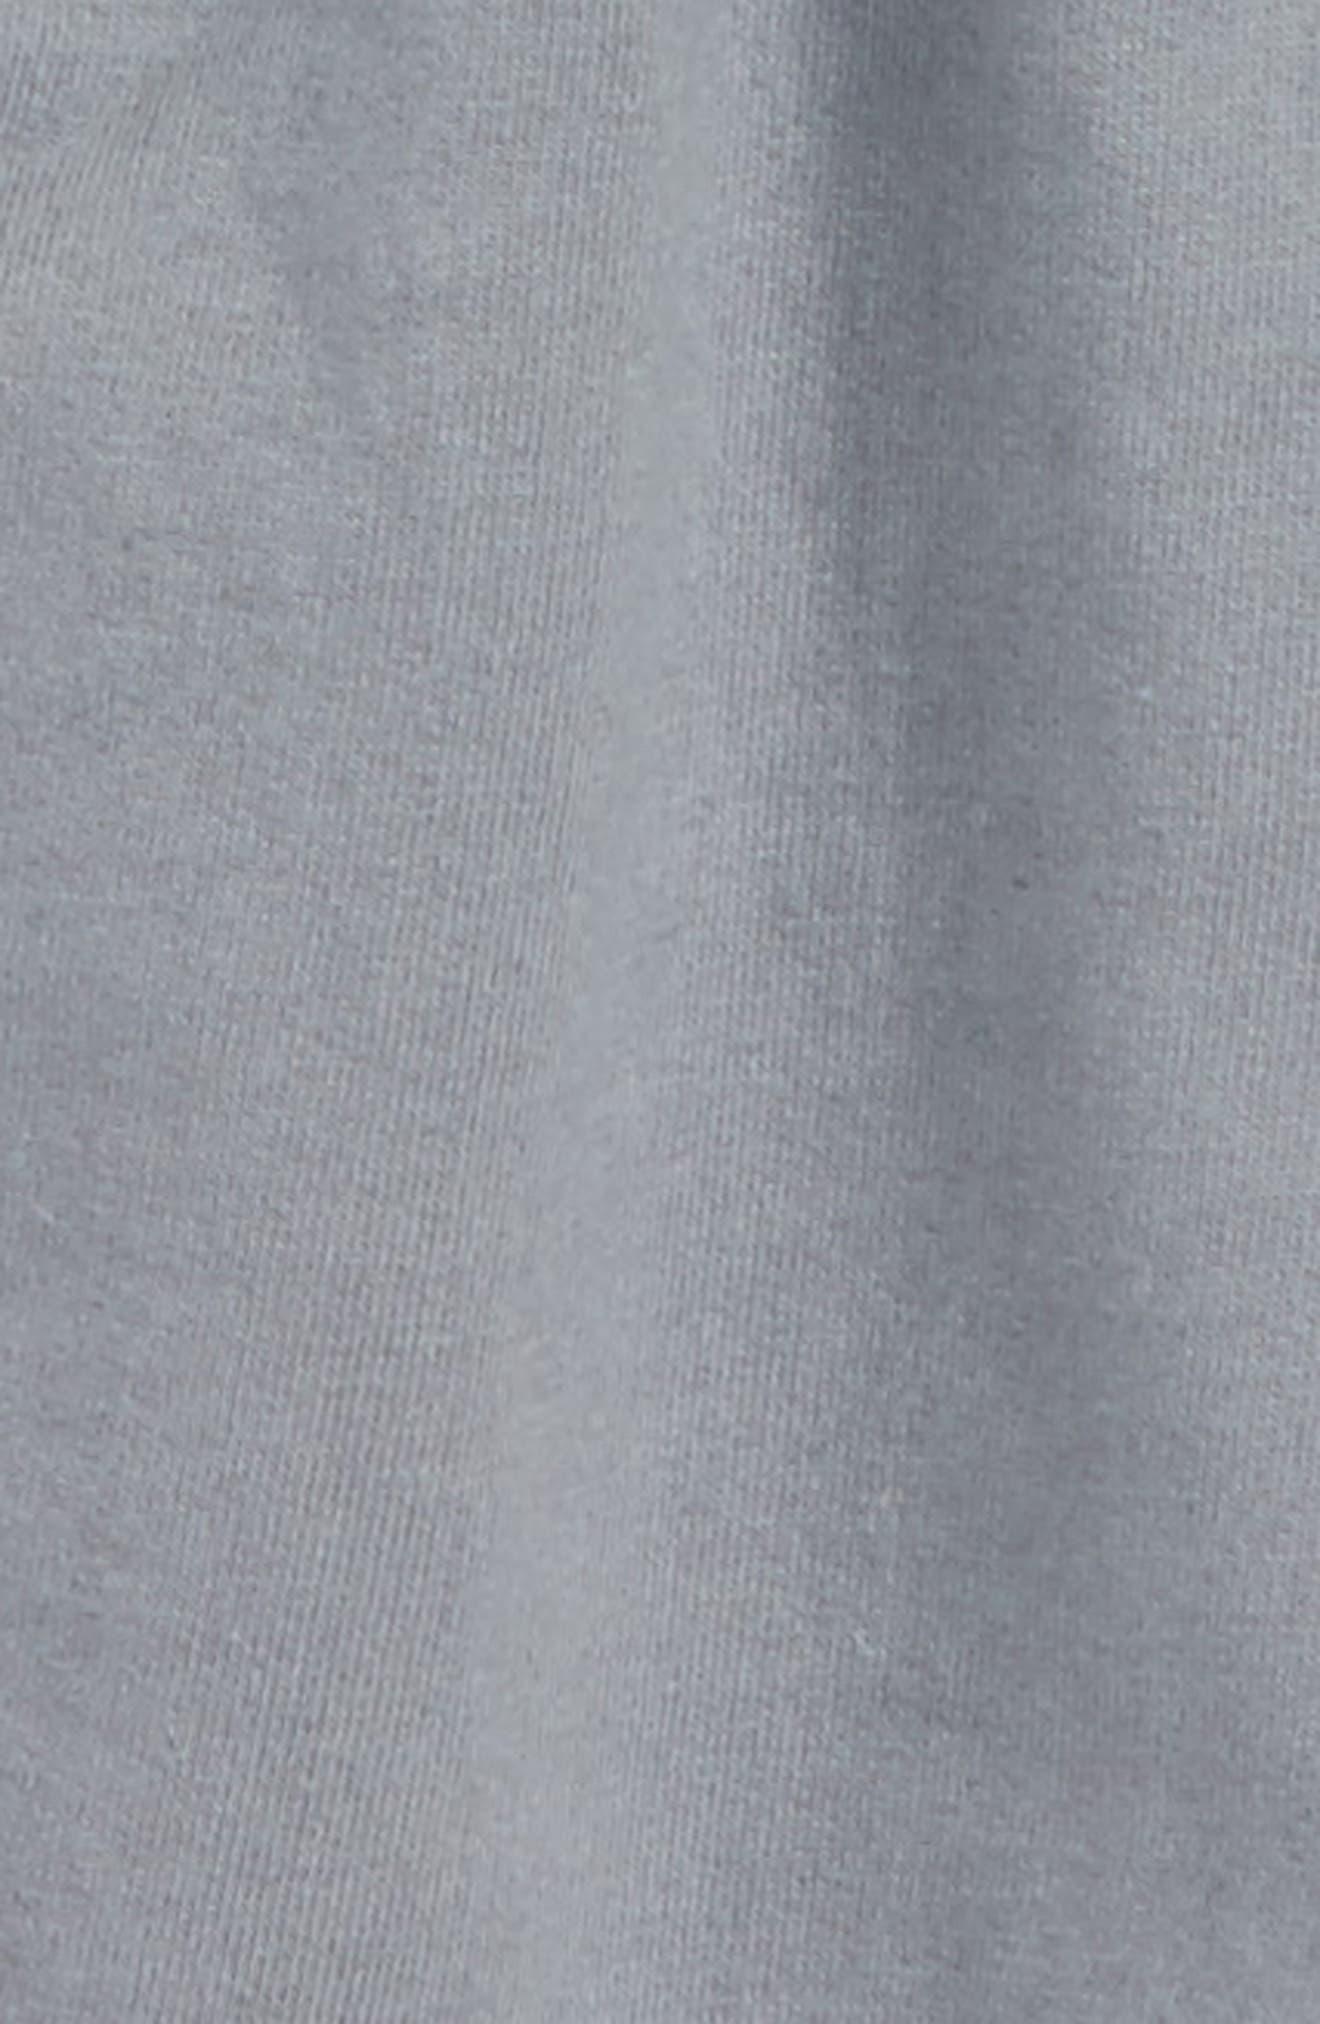 Bodysuit & Jogger Pants Set,                             Alternate thumbnail 2, color,                             Cool Grey